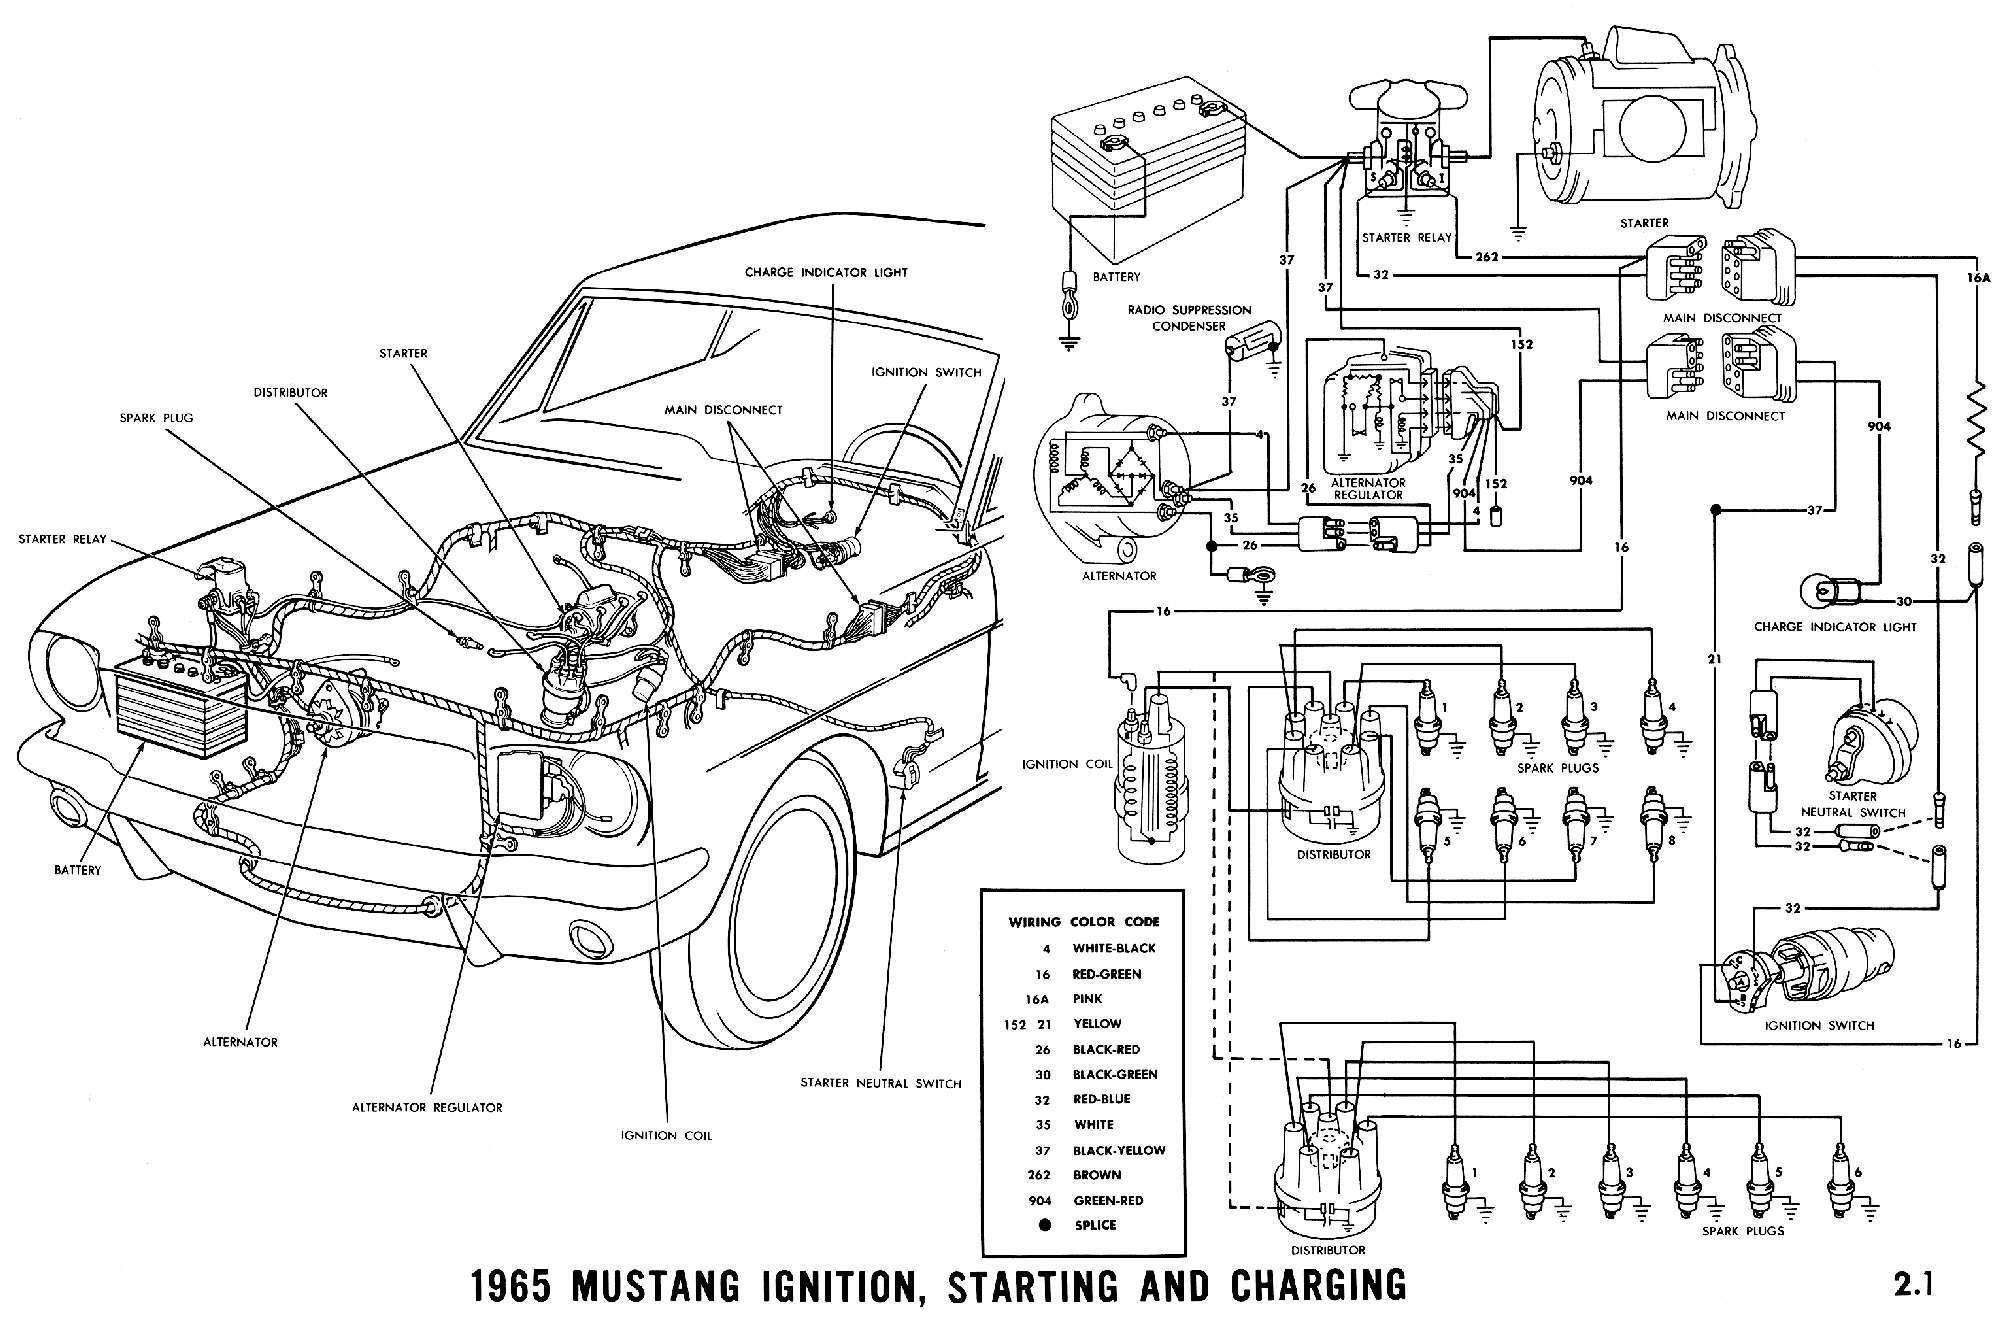 Simple Car Engine Diagram 2015 Mustang Engine Diagram Engine Car Parts and Ponent Diagram Of Simple Car Engine Diagram